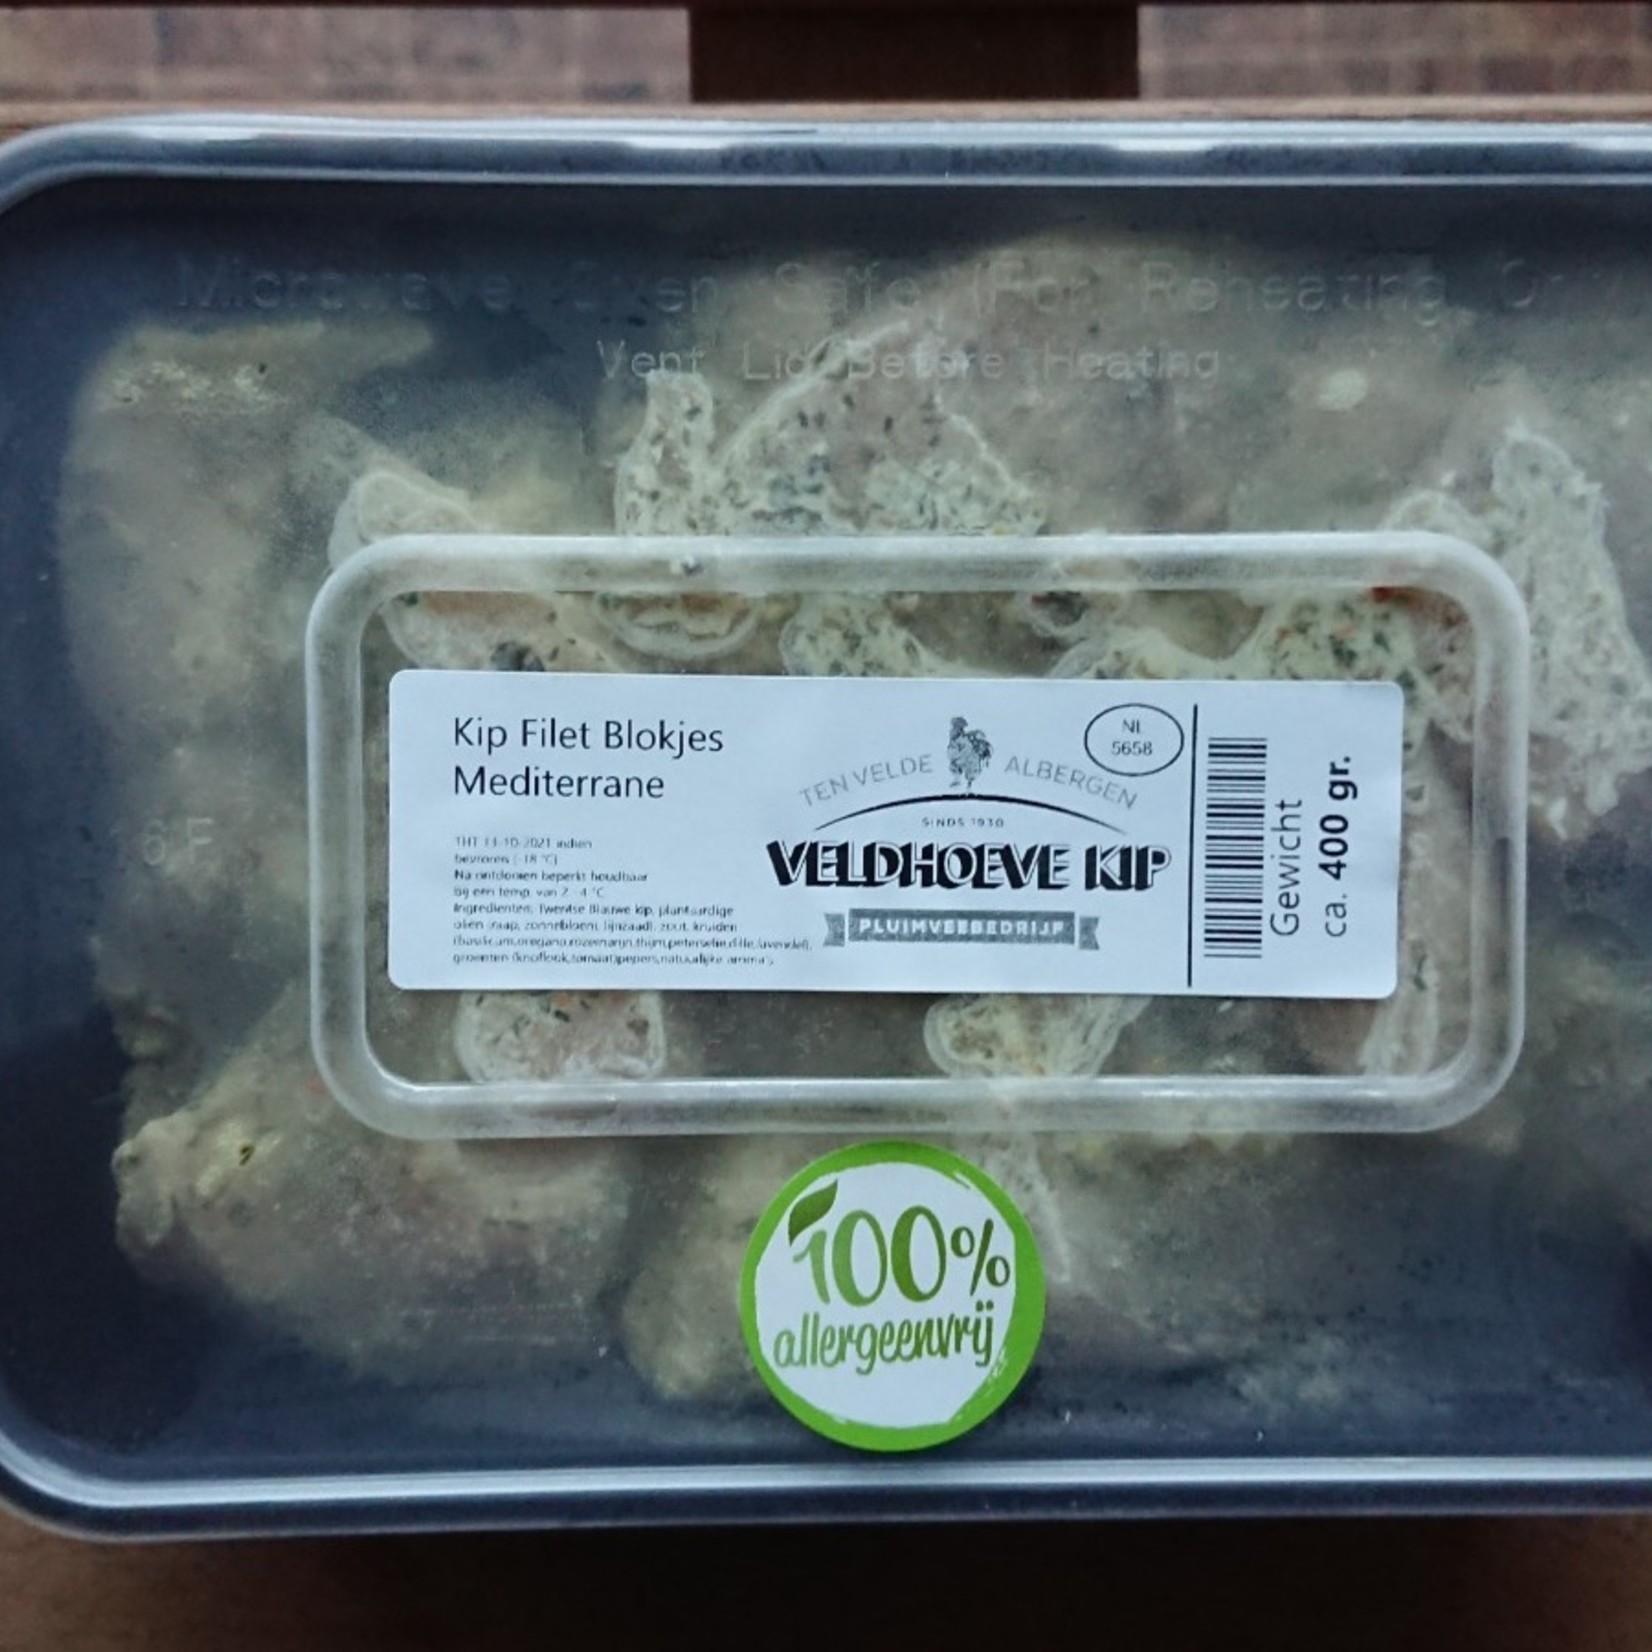 Twentse Blauwe filetblokjes Asia en Gember limoen chili en Mediterrane